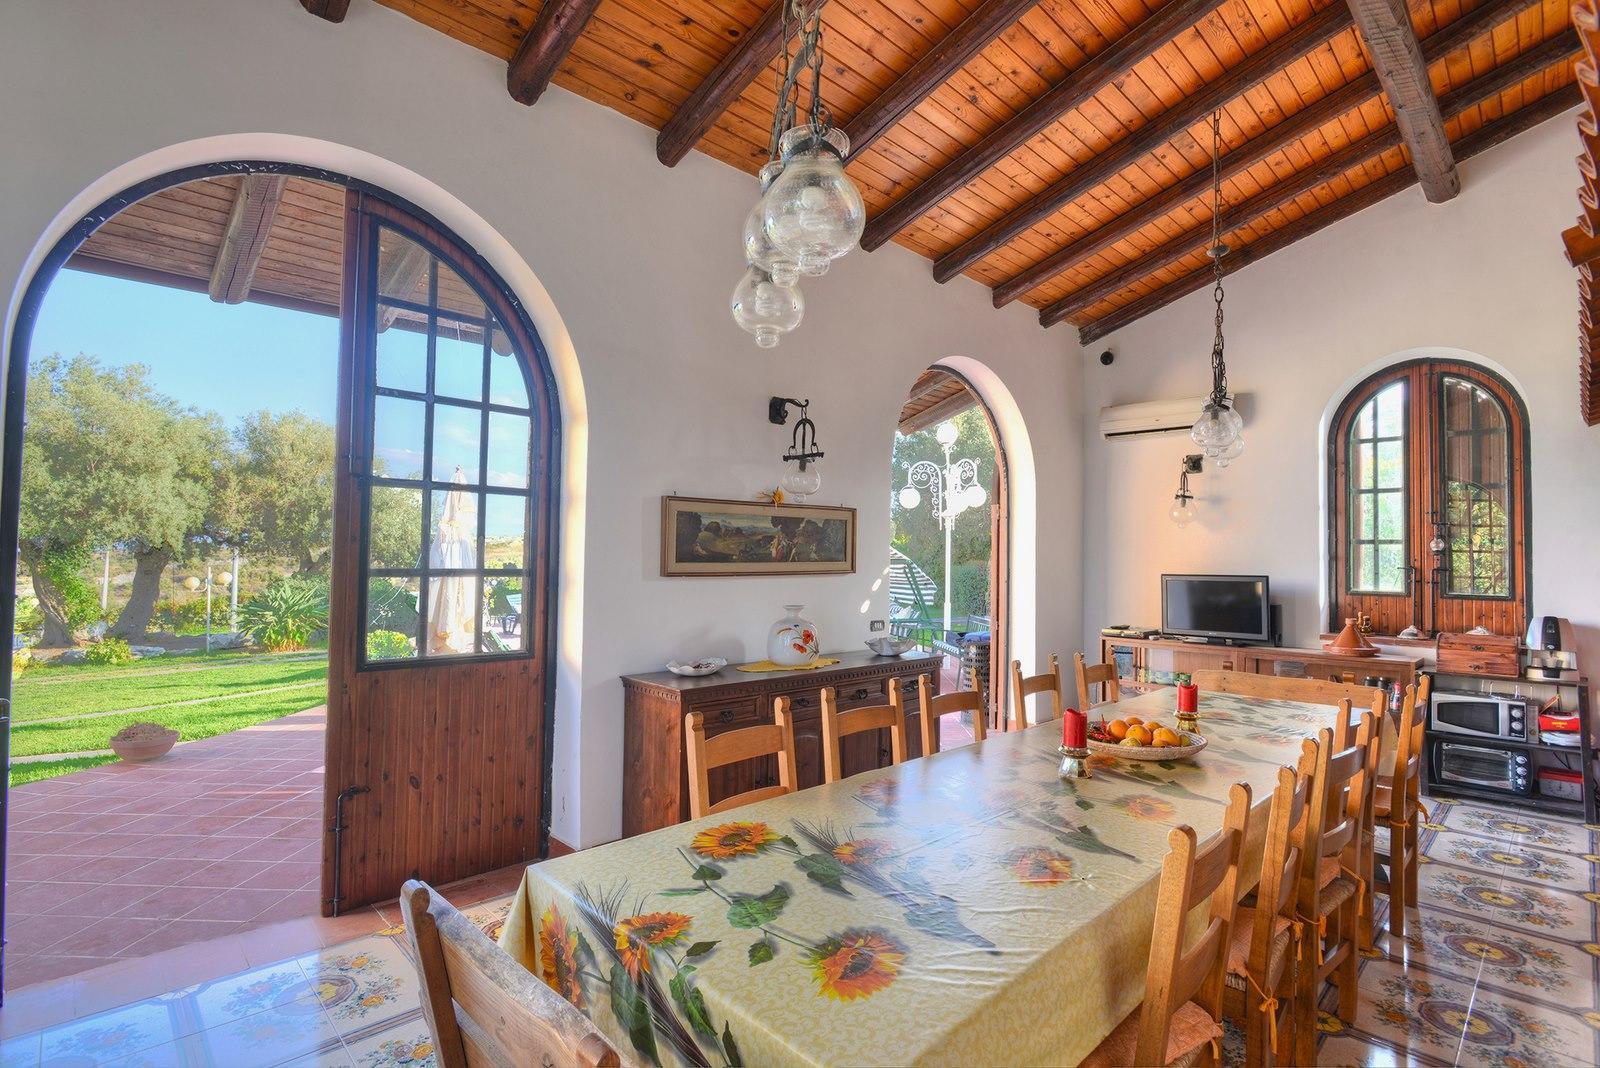 Maison de vacances Villa Casa (1531407), Solarino, Siracusa, Sicile, Italie, image 2